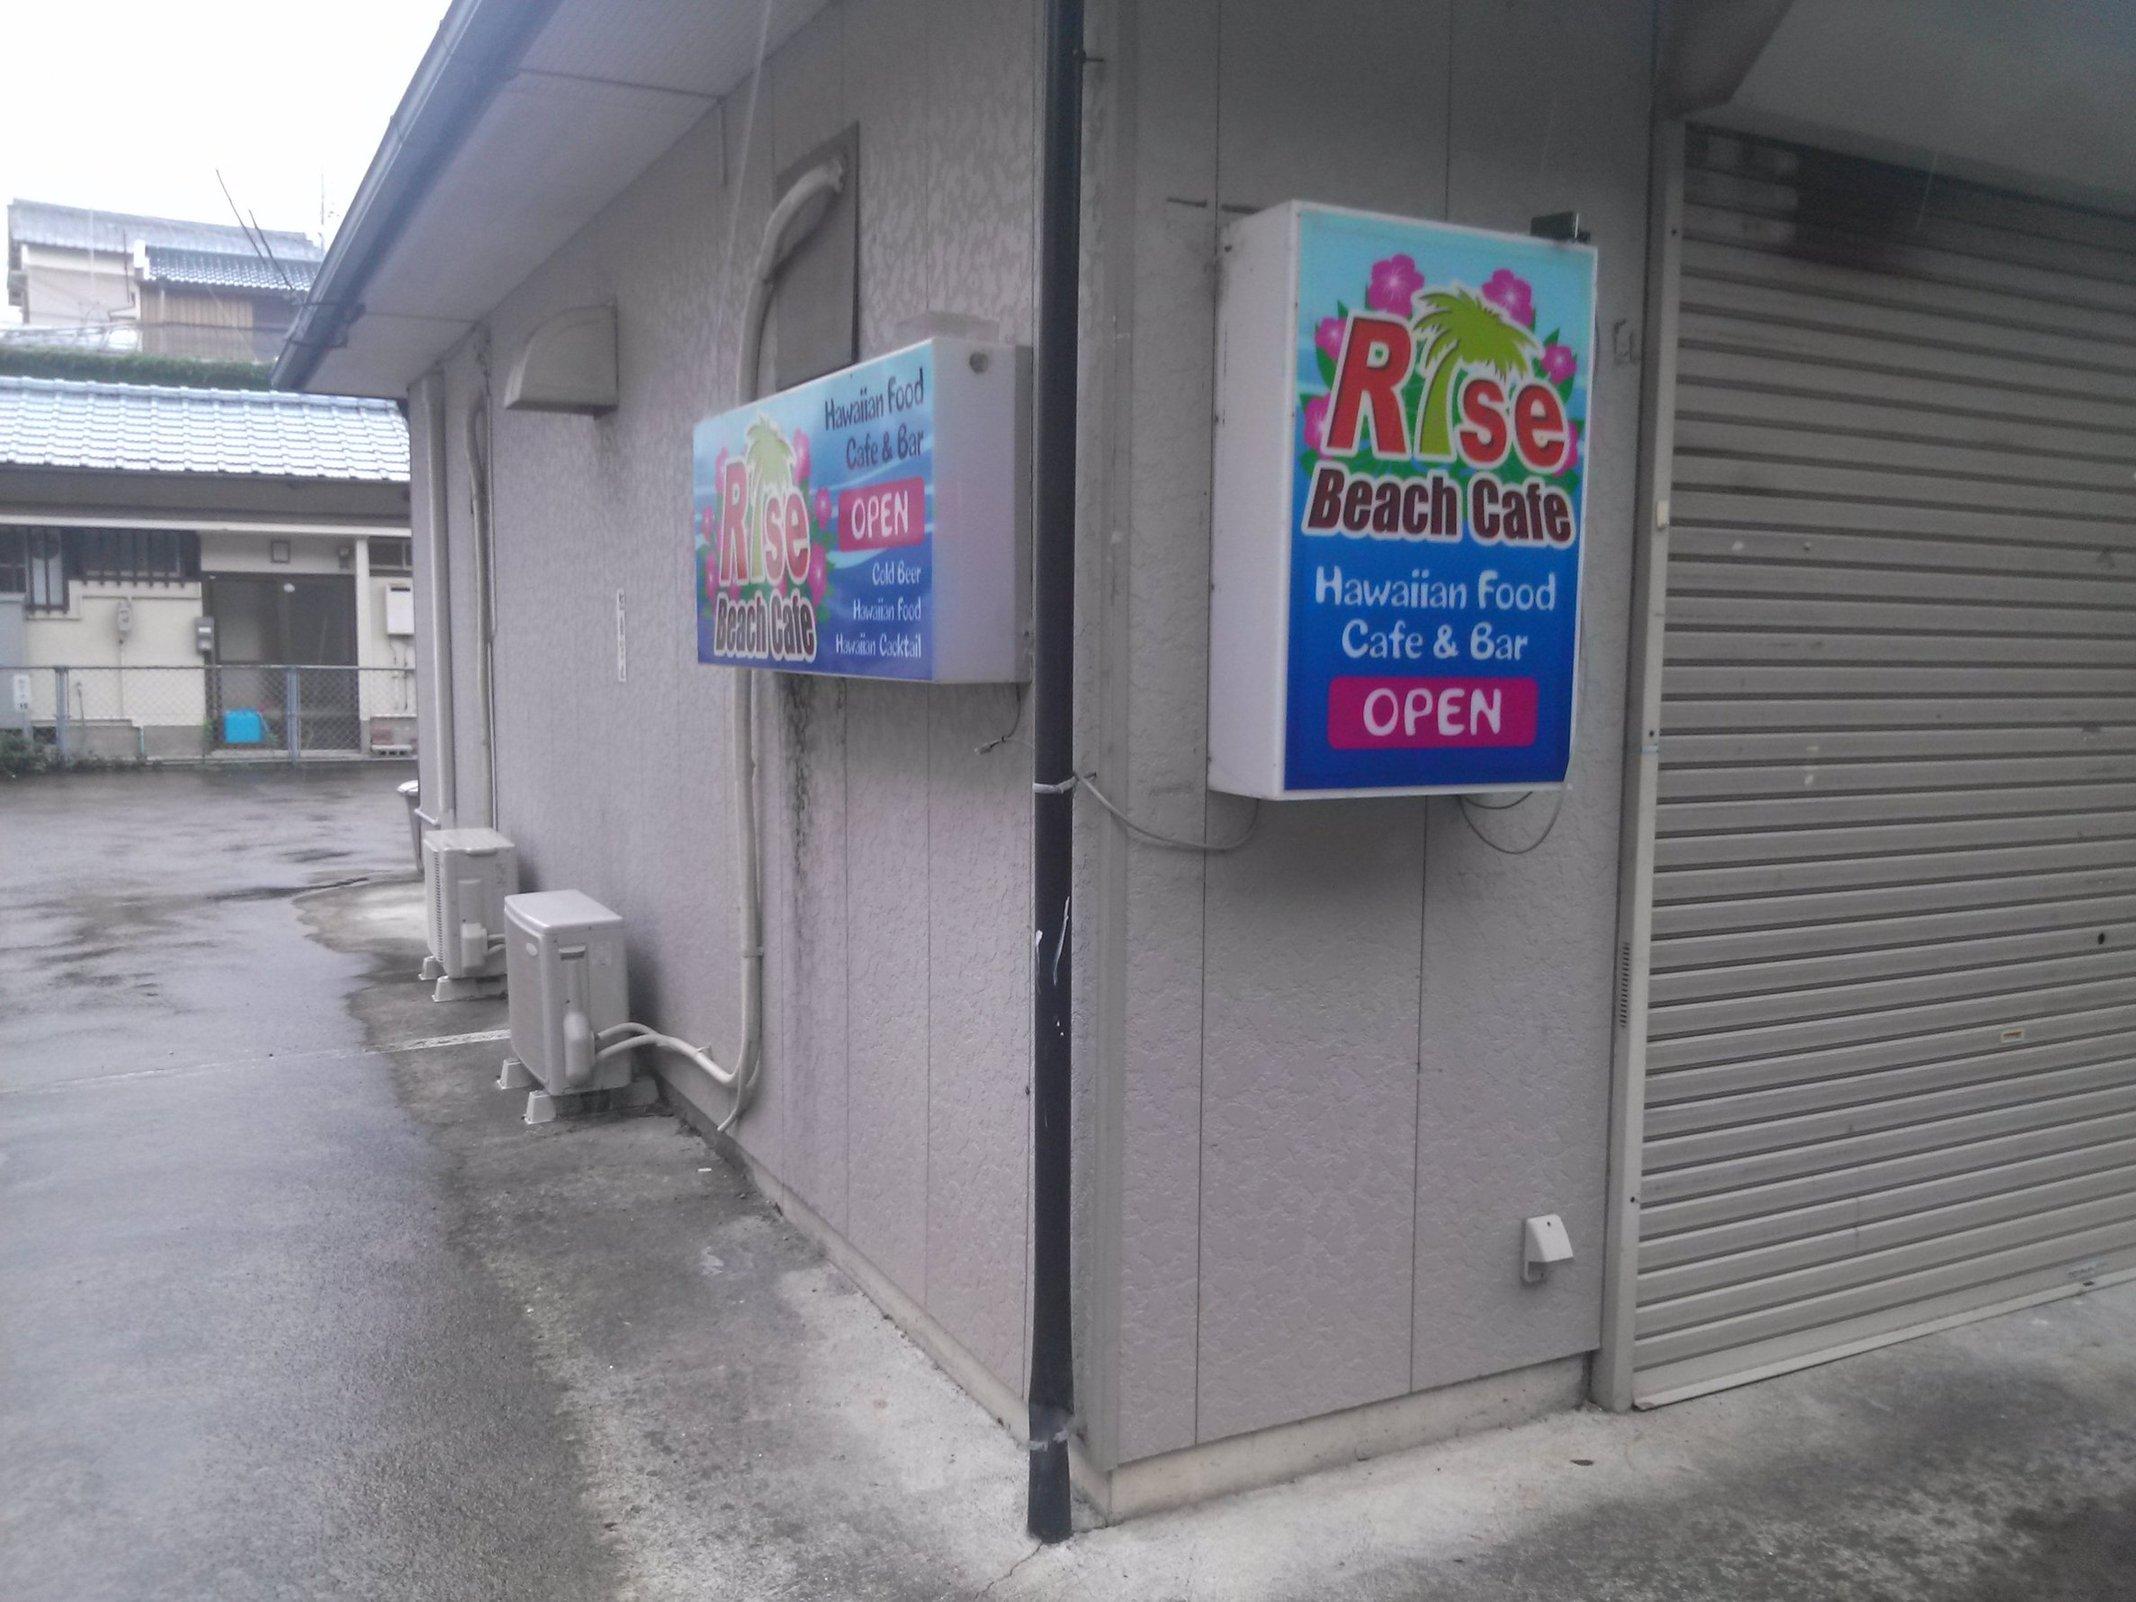 Rise Beach Cafe